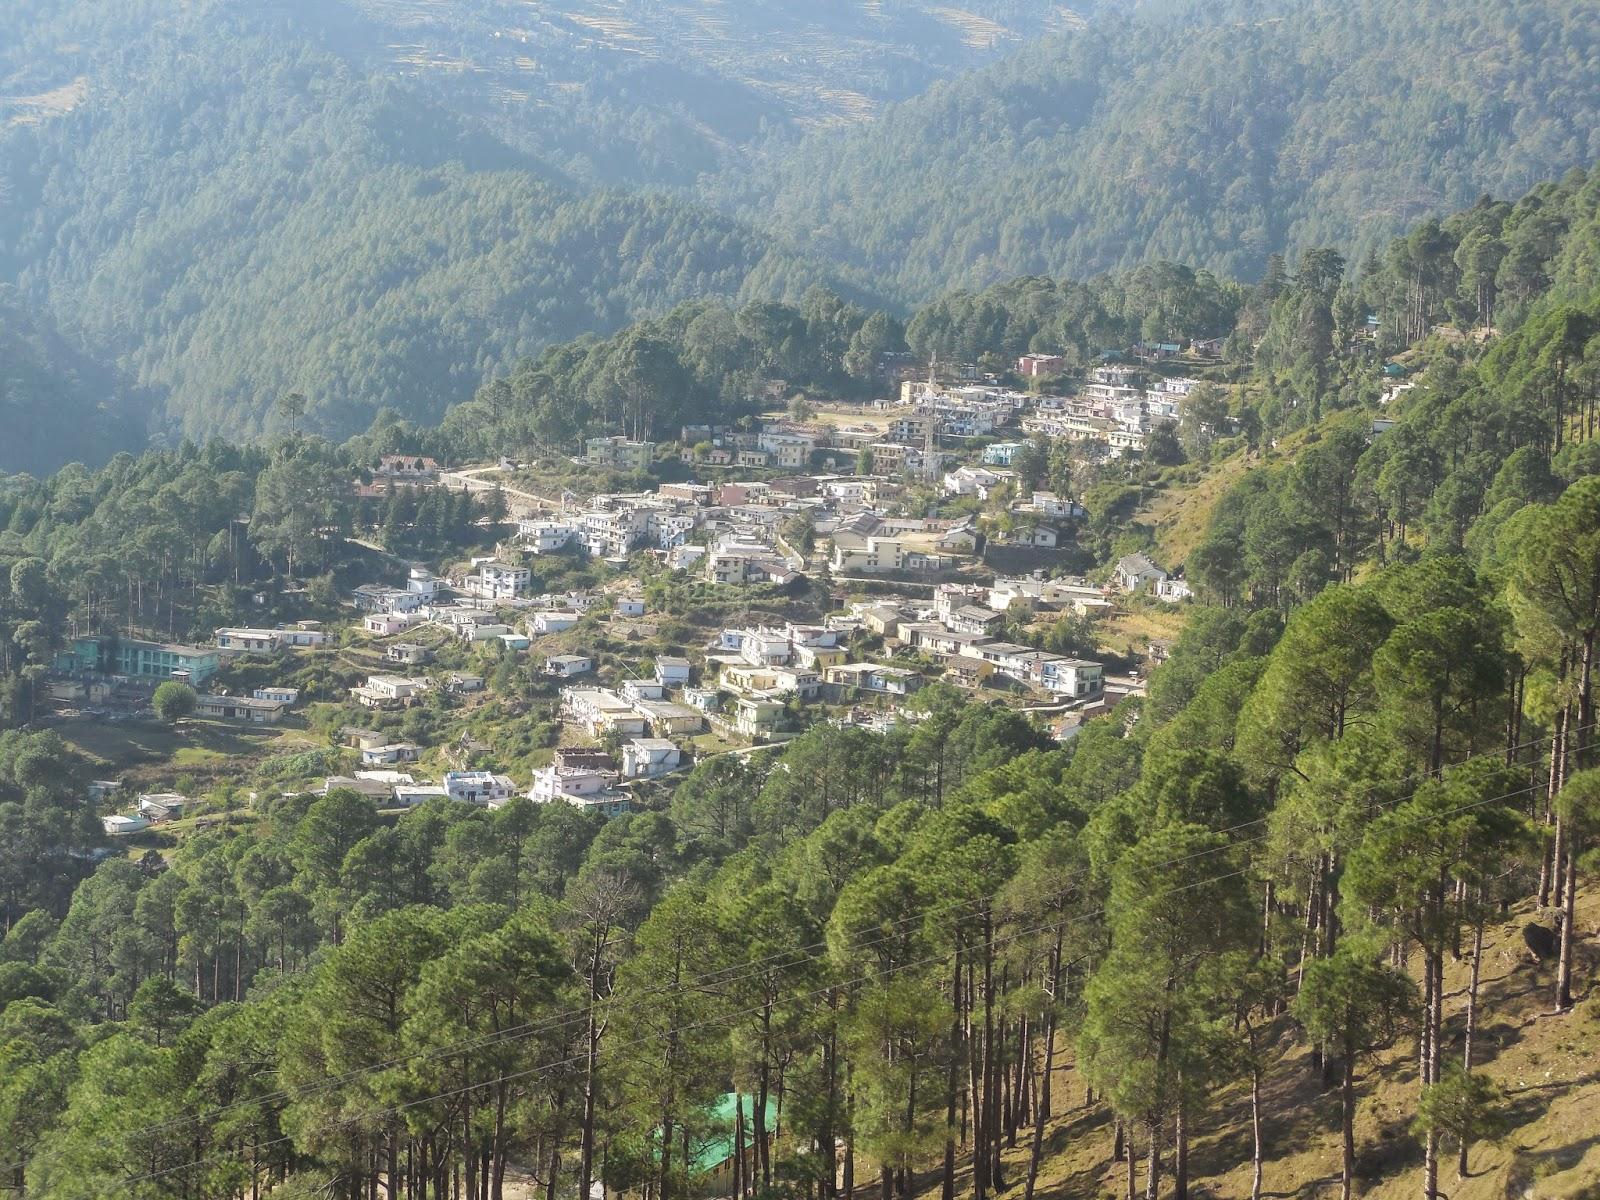 Pauri Garhwal India  city photos : India Tourism : Thalisain, Pauri Garhwal, Uttarakhand